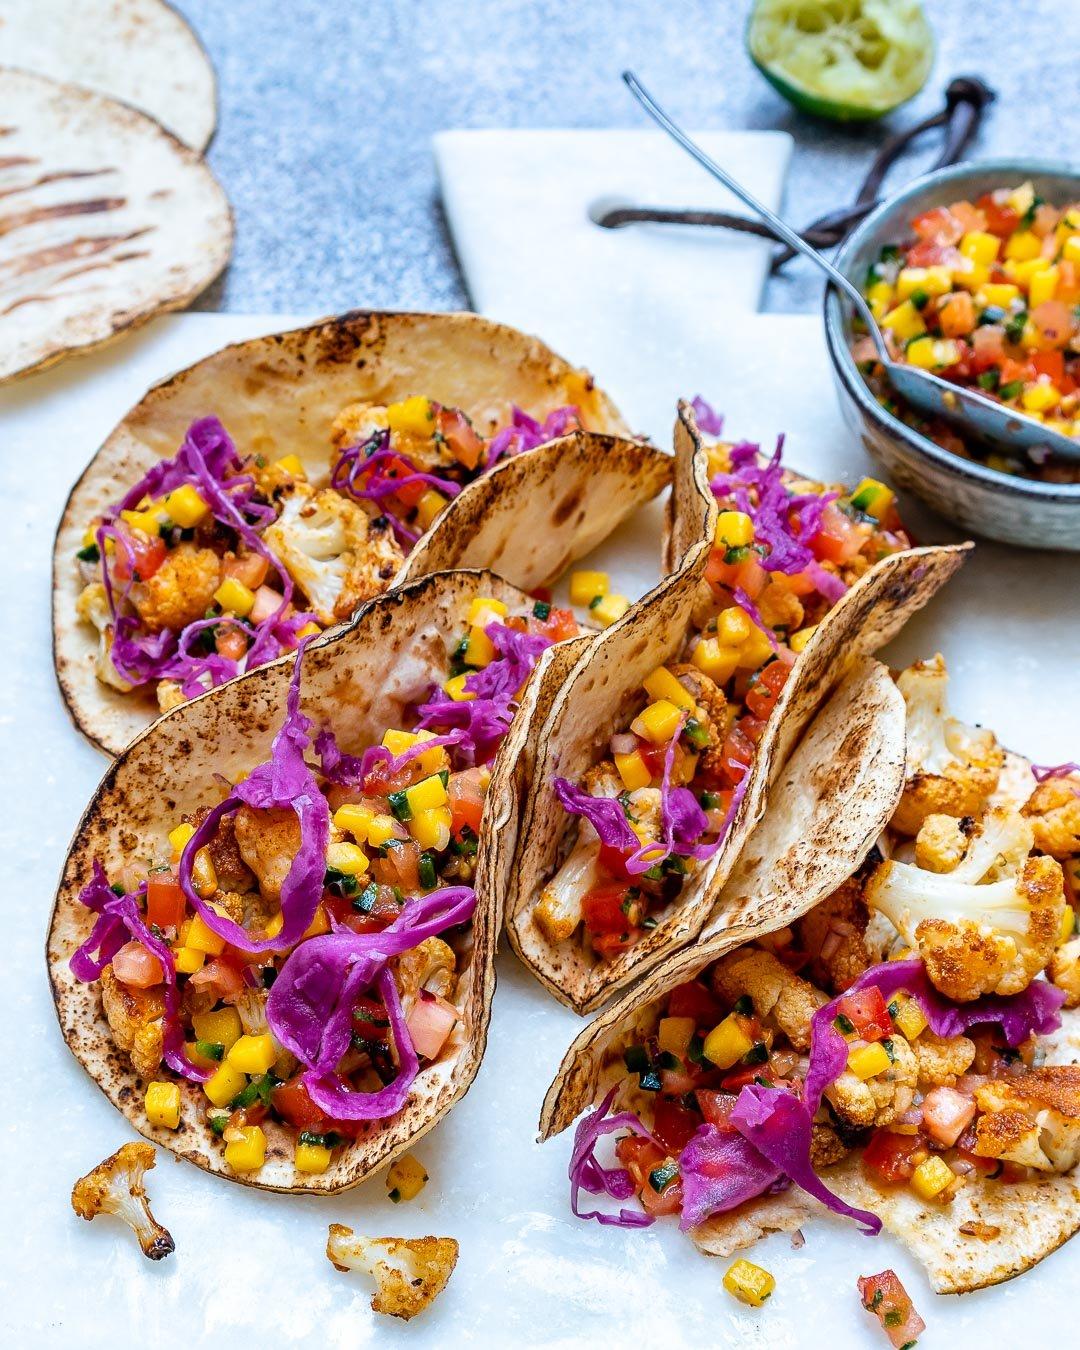 Reteta De Tacos Vegan